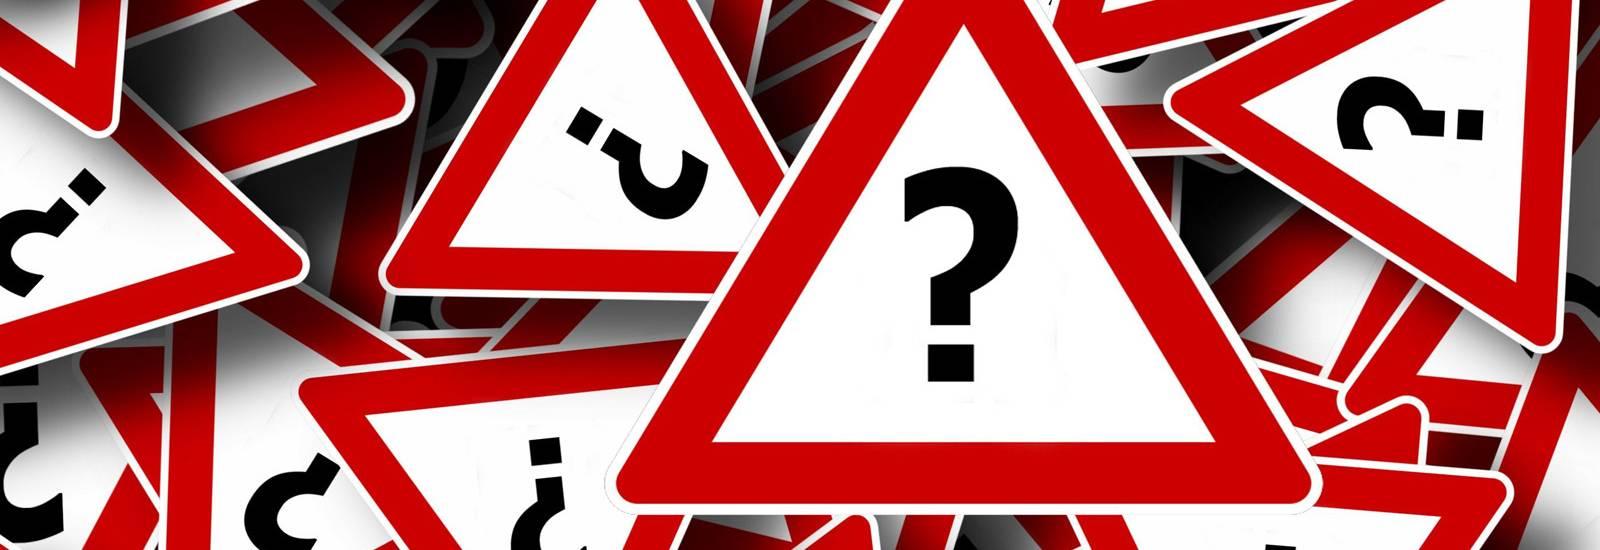 question-mark-bowel-problems-canterbury-kent.jpg